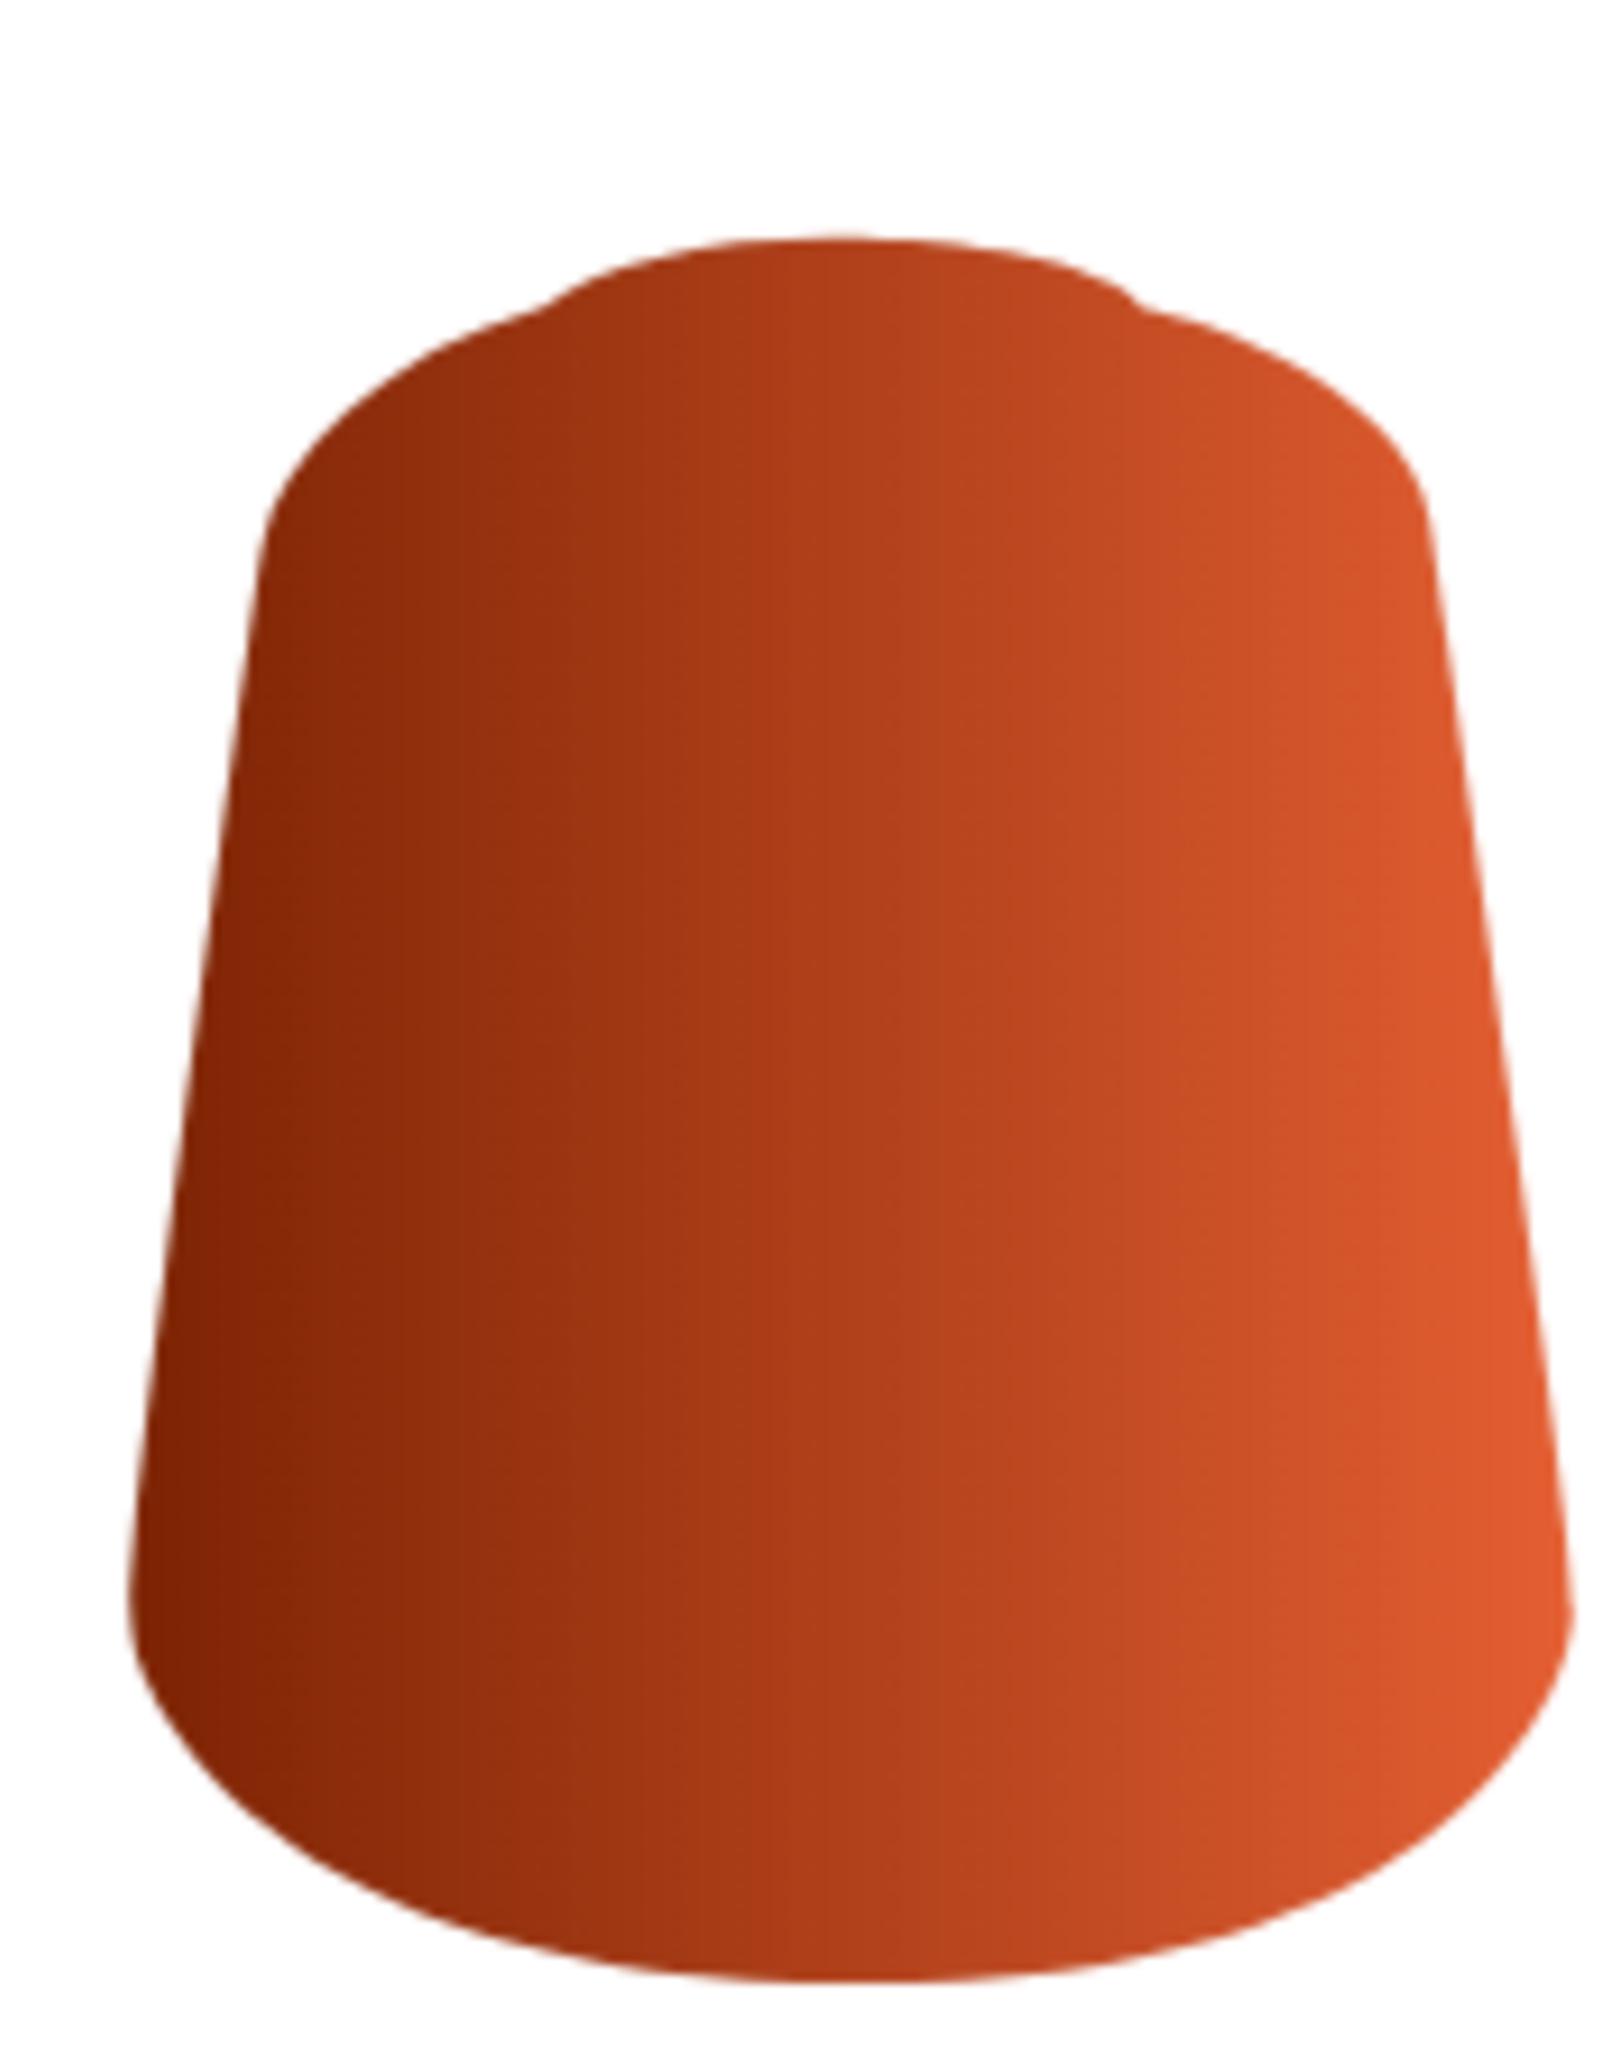 Games Workshop Contrast: Gryph-Hound  Orange (18ML) Paint